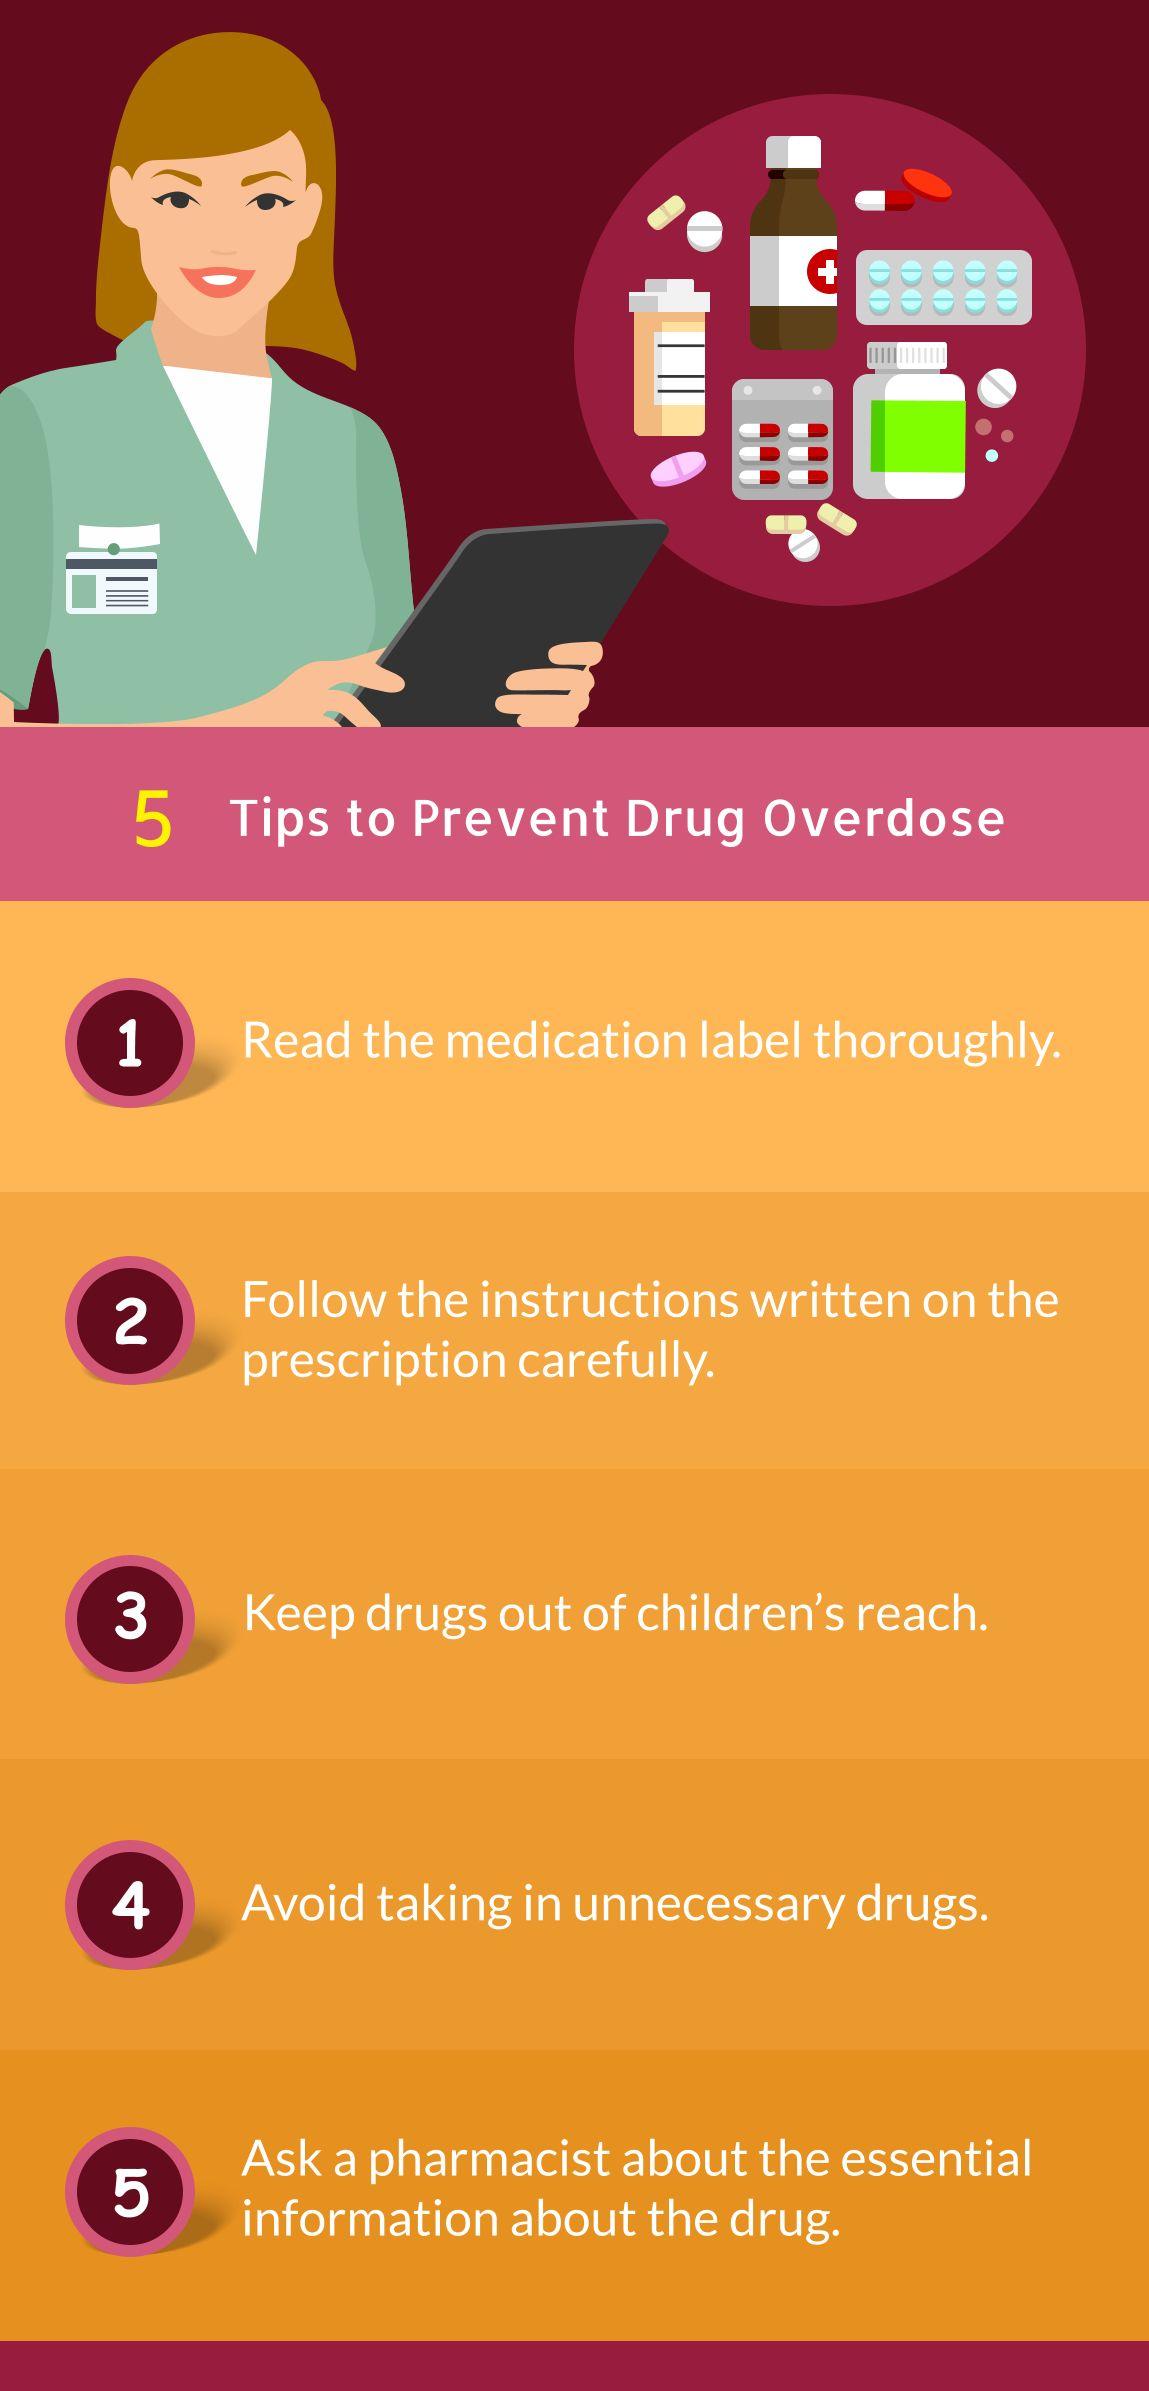 infographic 5 tips to prevent drug overdose tips overdose